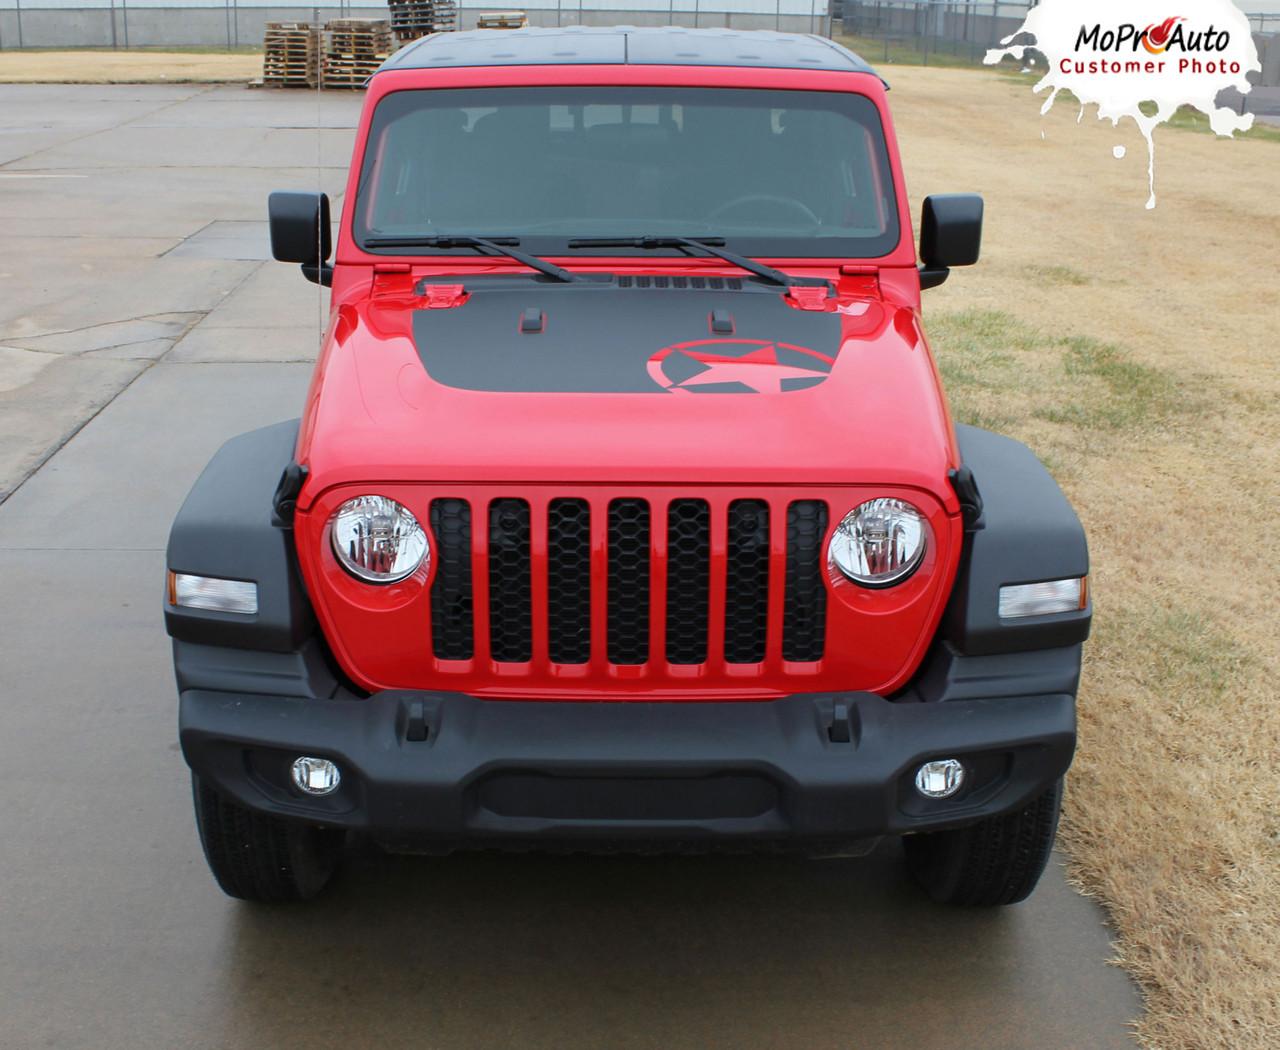 Jeep Gladiator Hood Decals, Jeep Gladiator Stripes, Gladiator Graphics